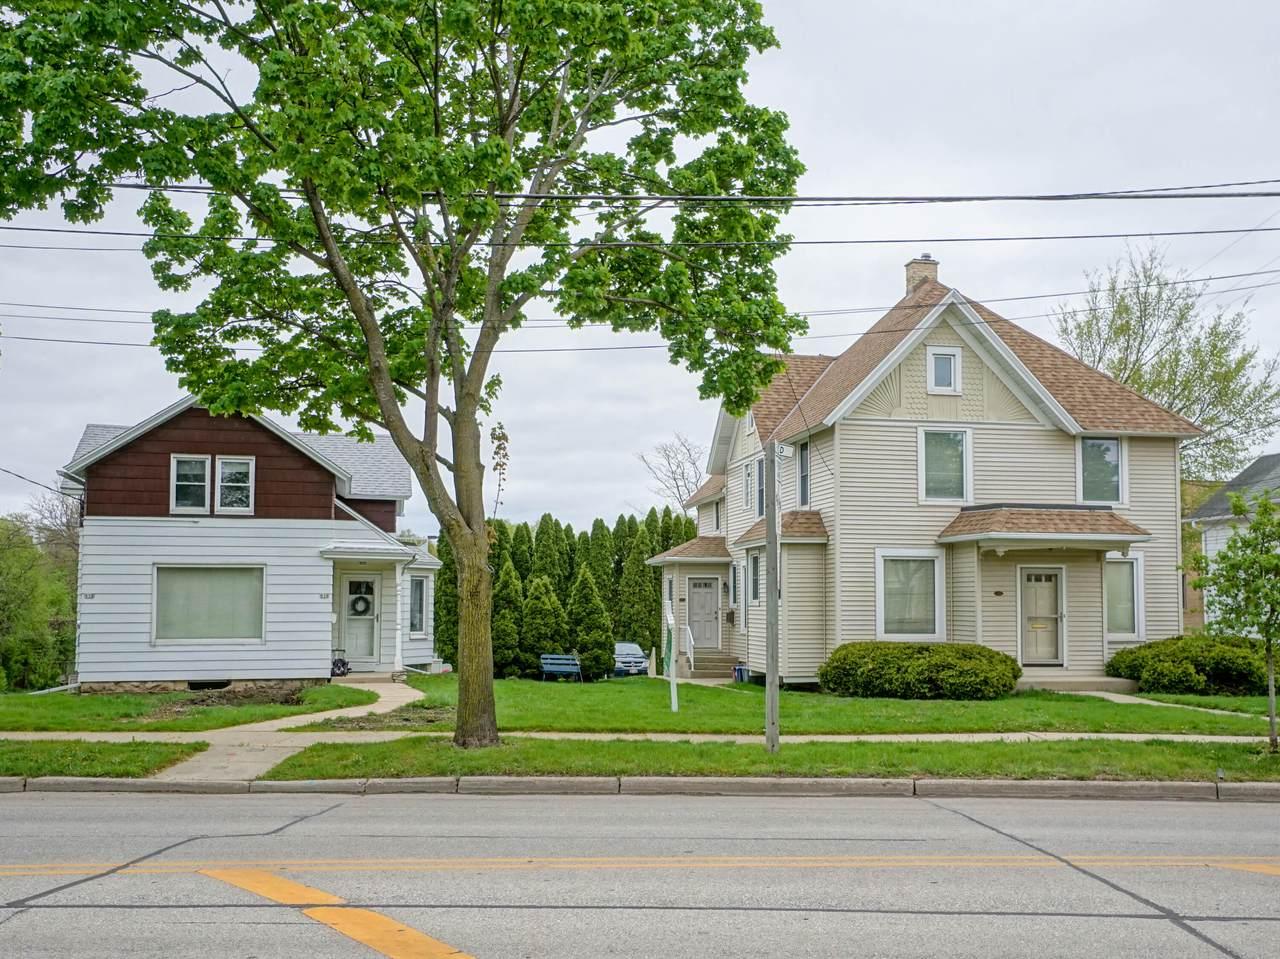 844 Glenview Ave - Photo 1